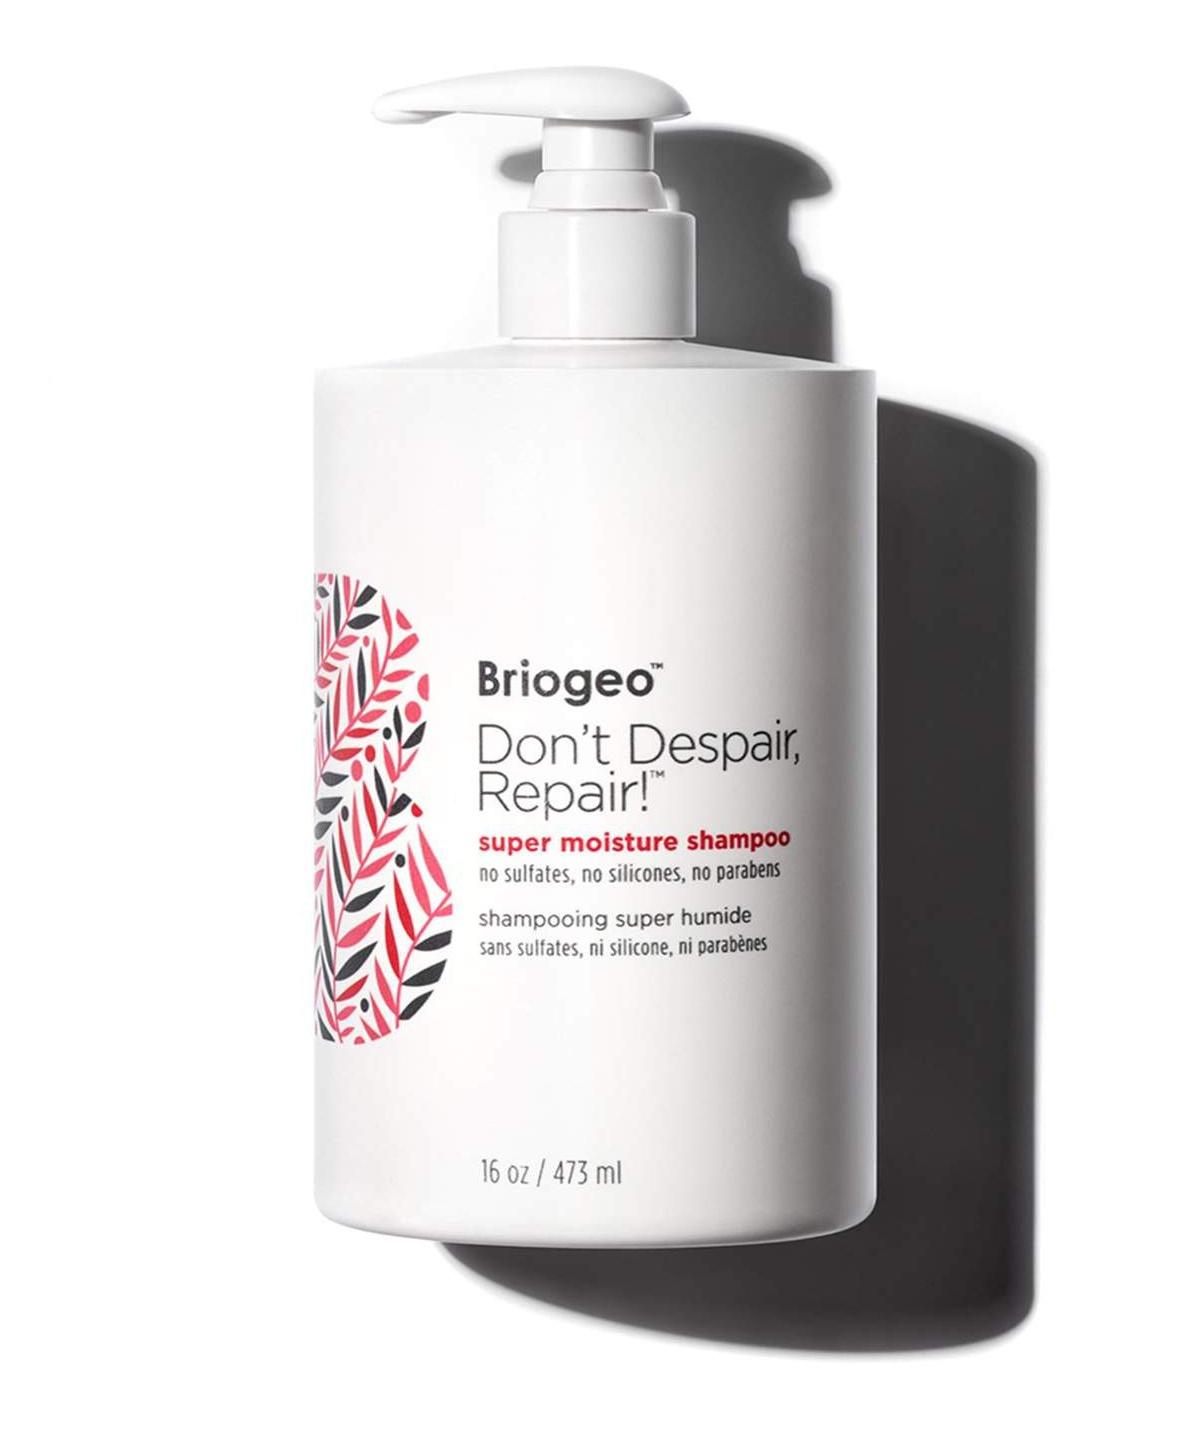 Briogeo Super Moisture Shampoo